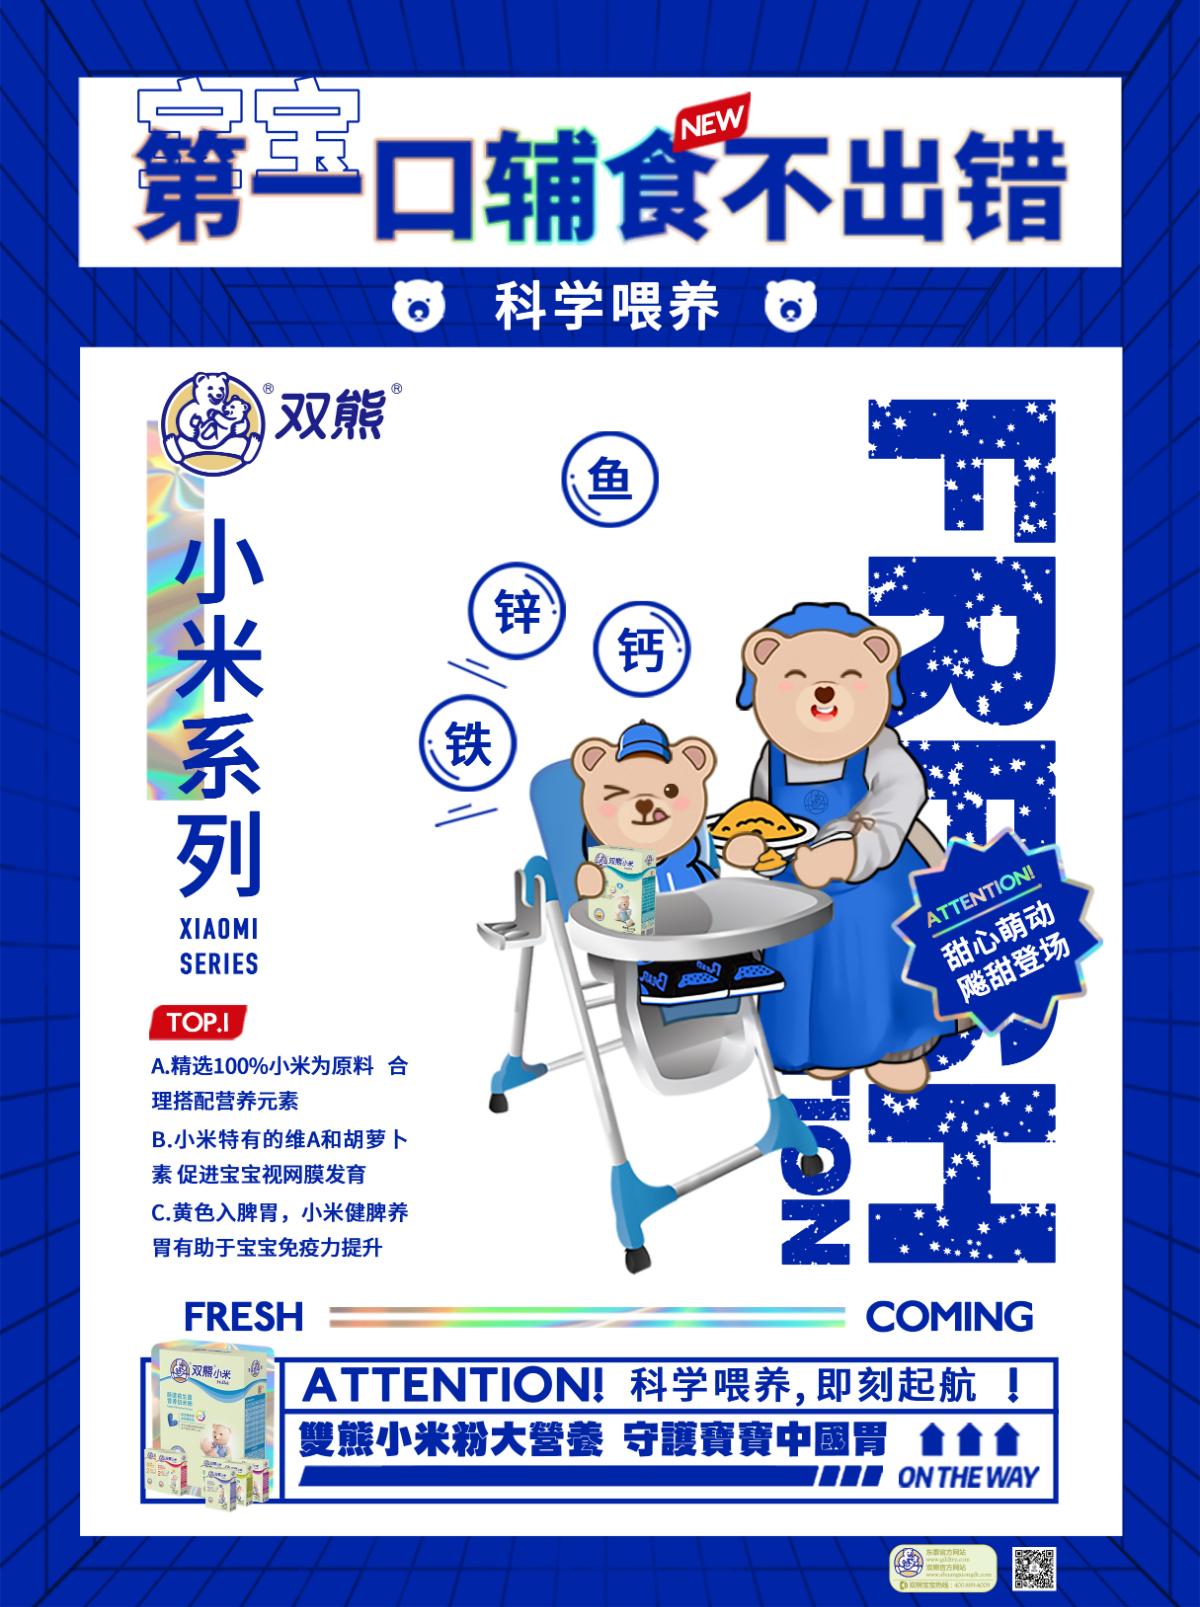 辅食新品海报1281c (1).jpg